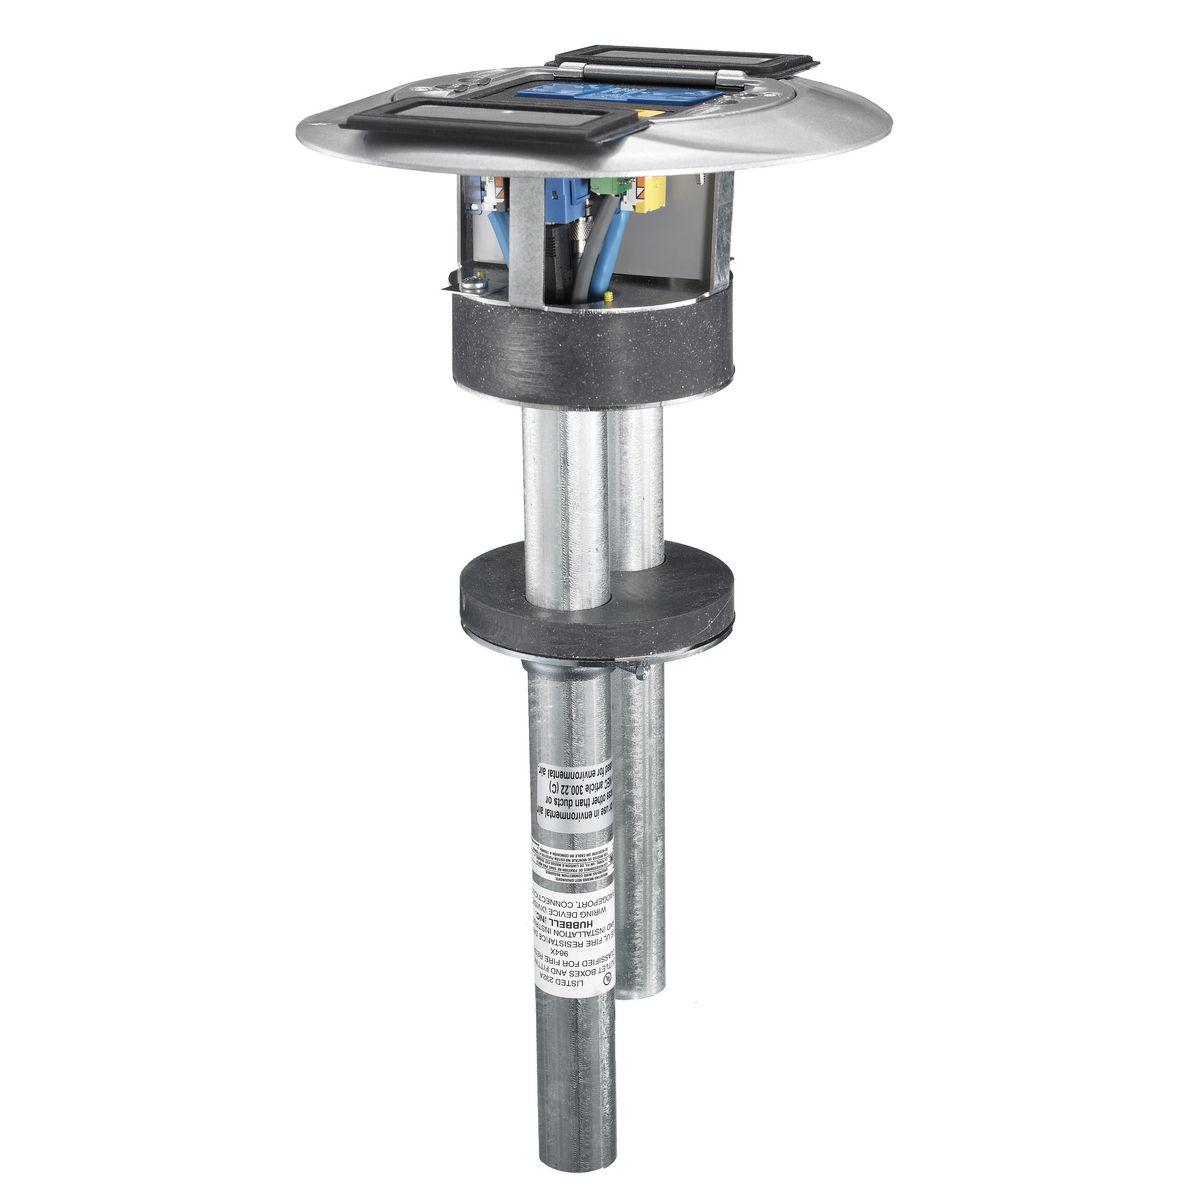 S1ptalj Brand Hubbell Premise Wiring